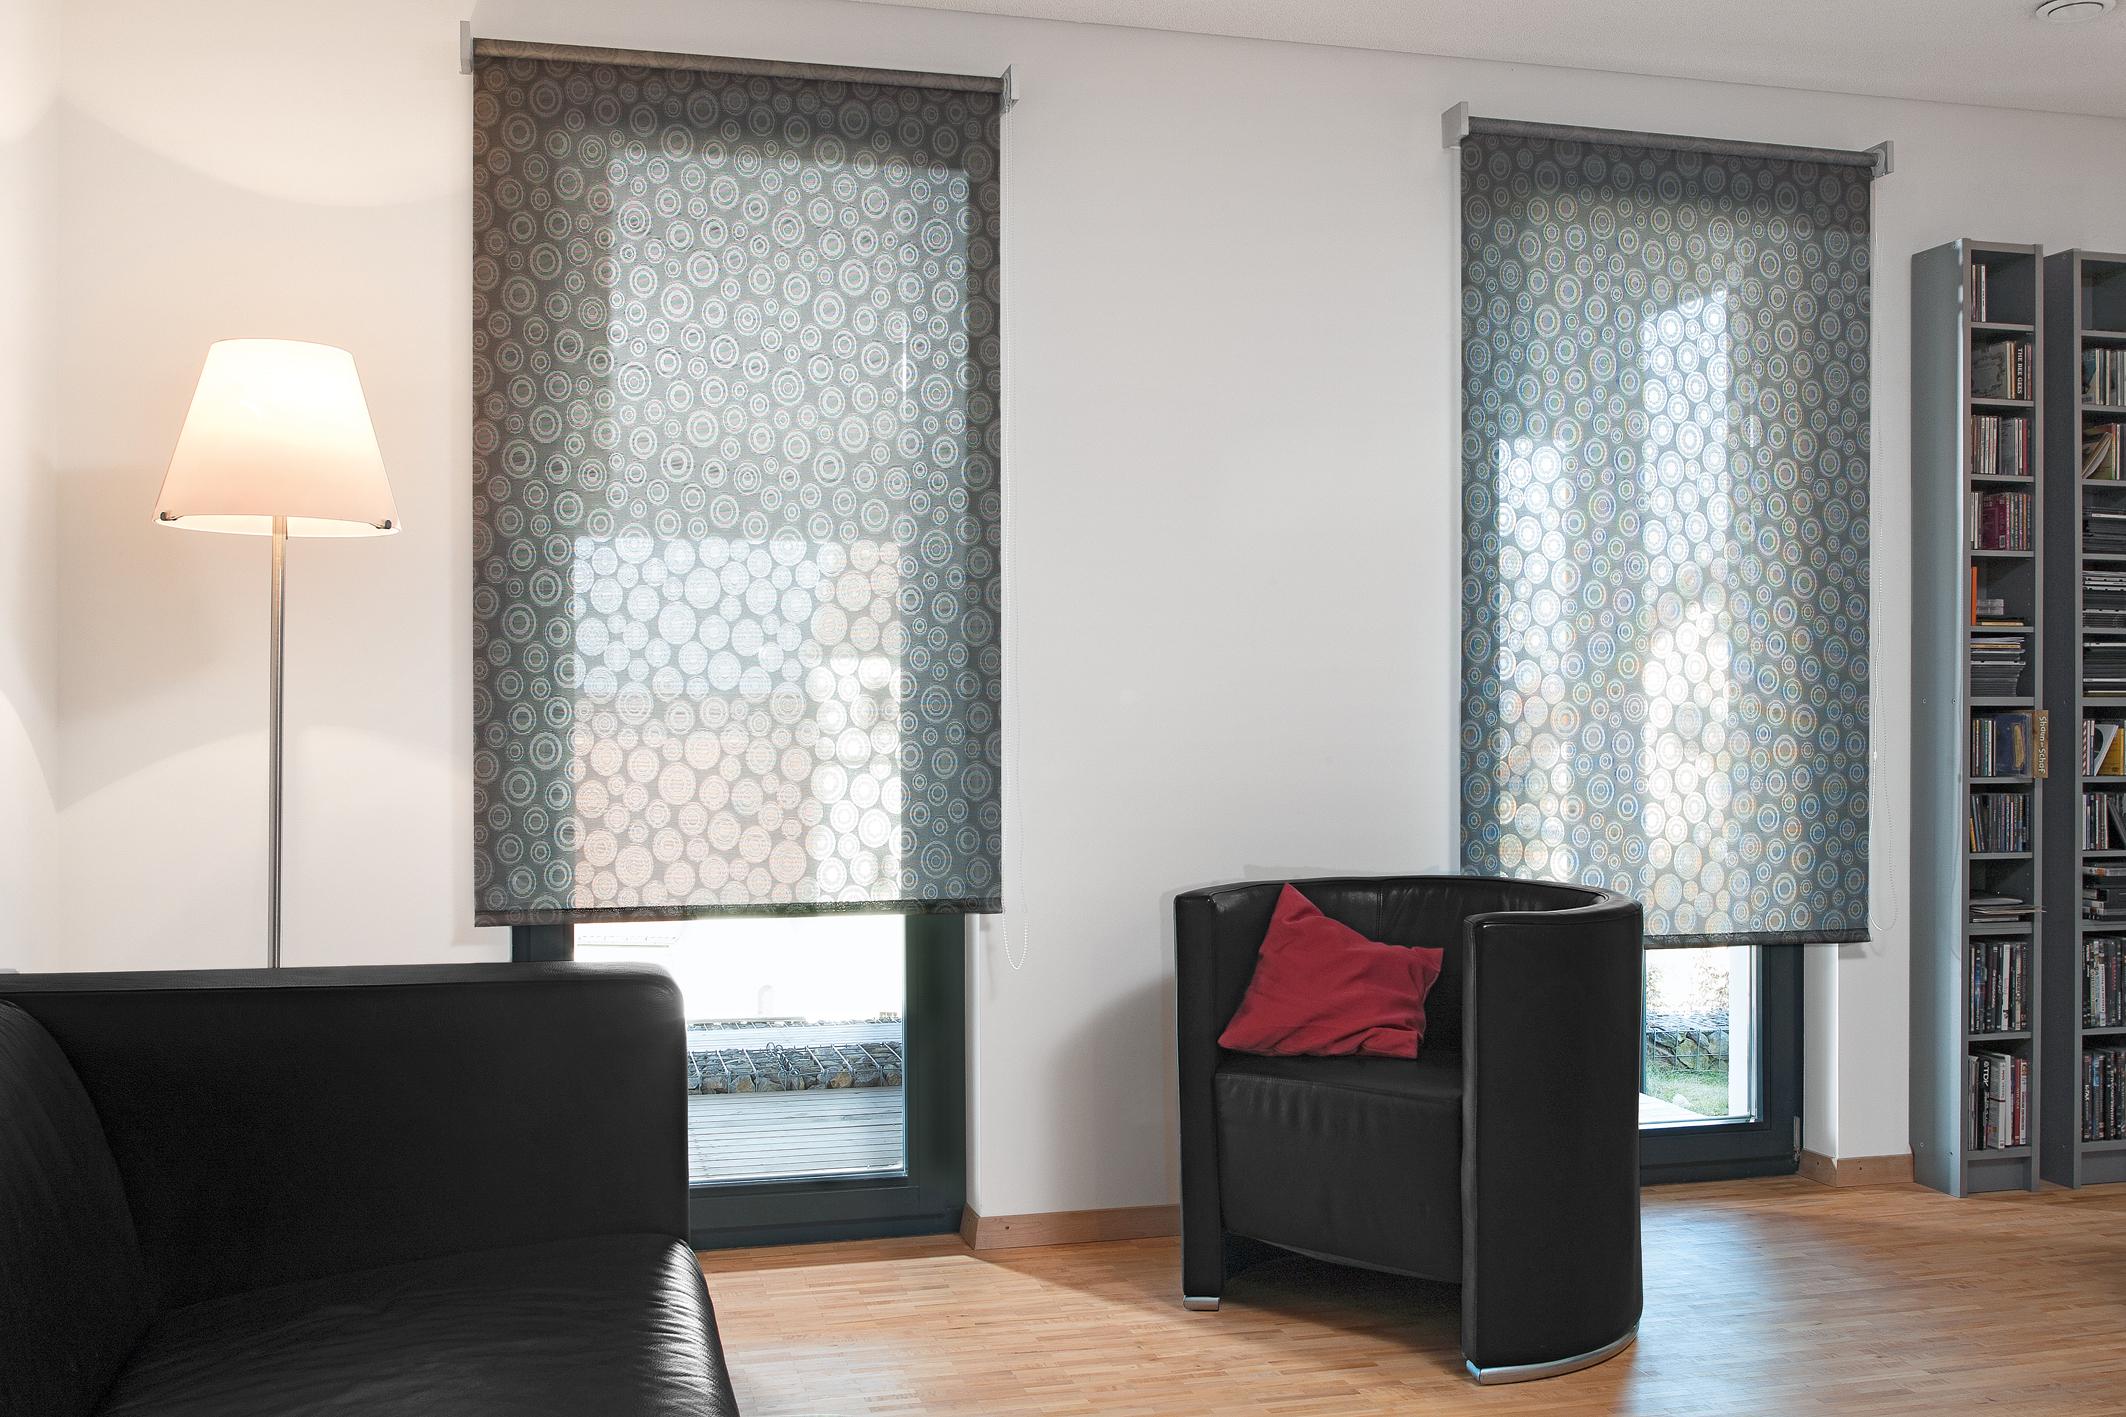 areco spol s r o produkty rolety. Black Bedroom Furniture Sets. Home Design Ideas